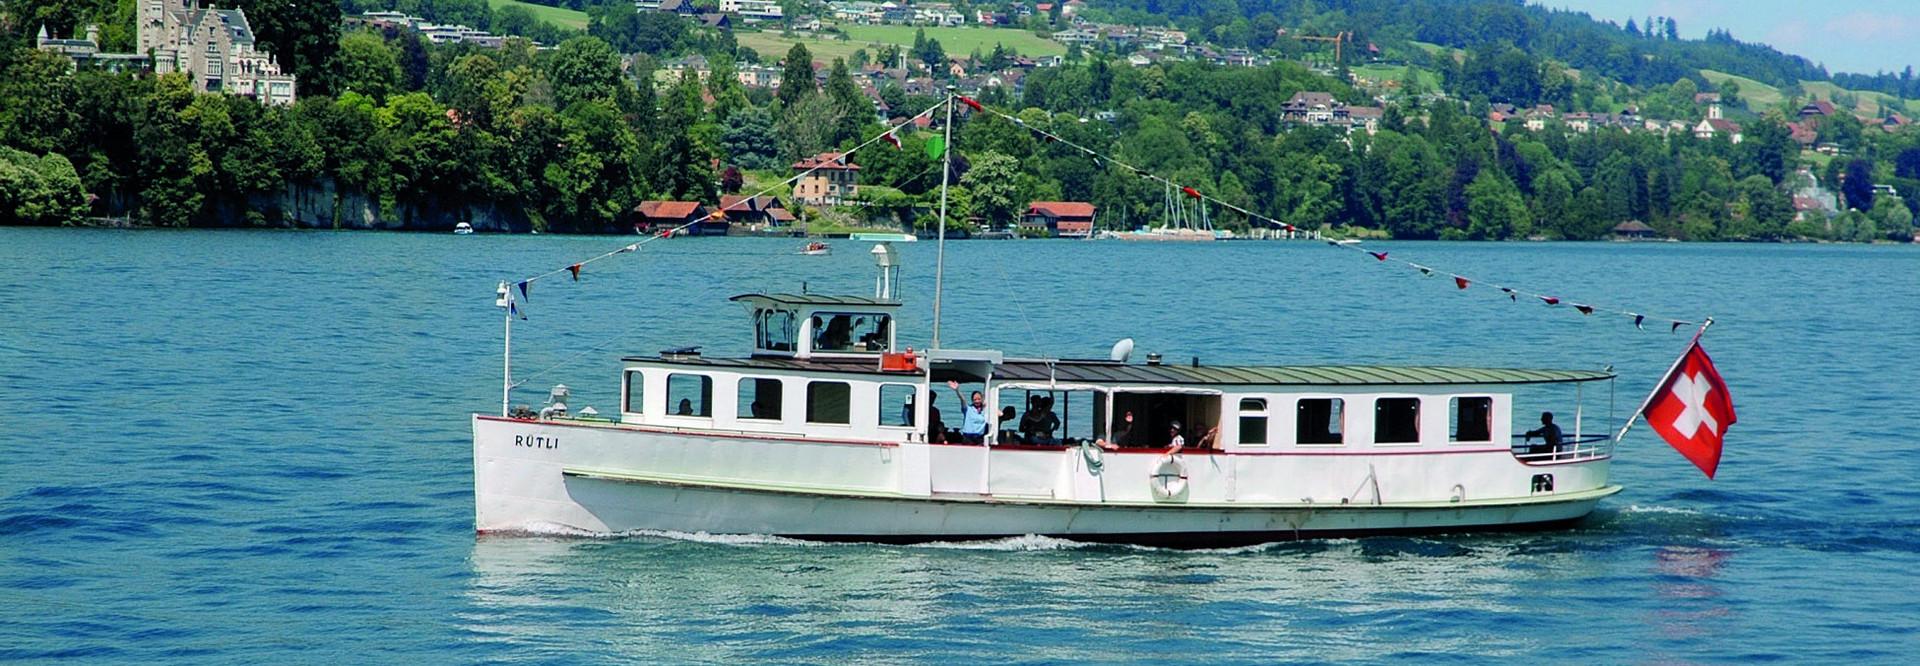 The motor vessel Rütli sails on Lake Lucerne in fine weather.